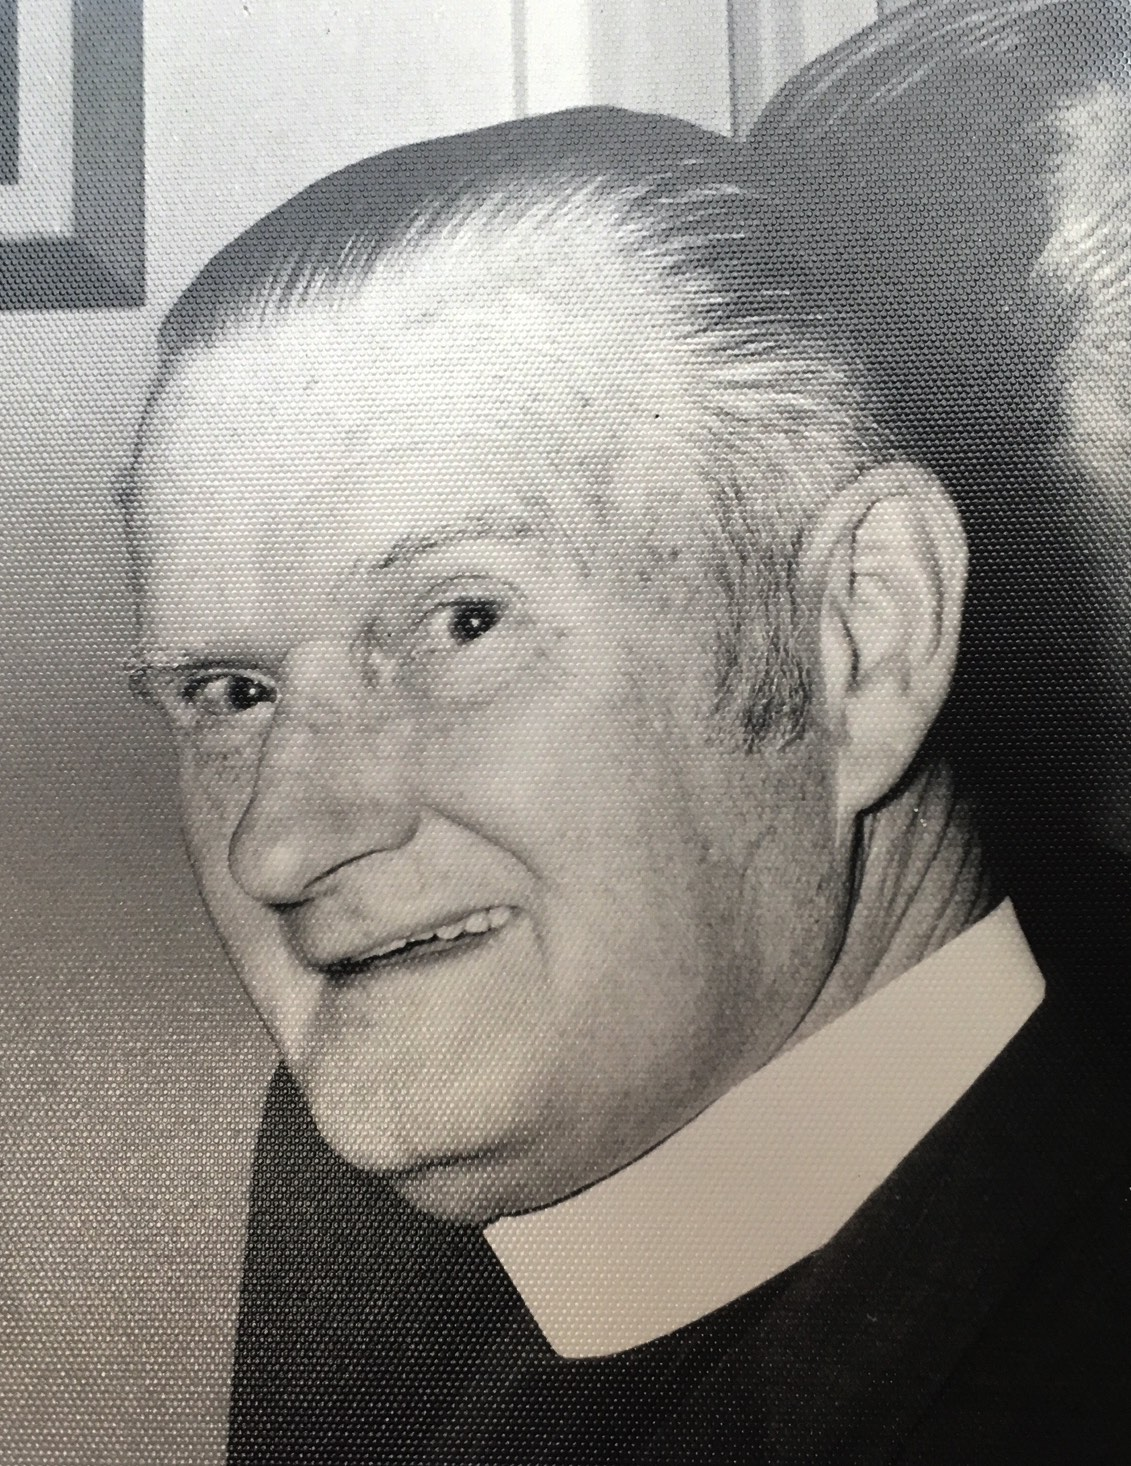 Lane Cove Music Founder - Rev. Blanchard